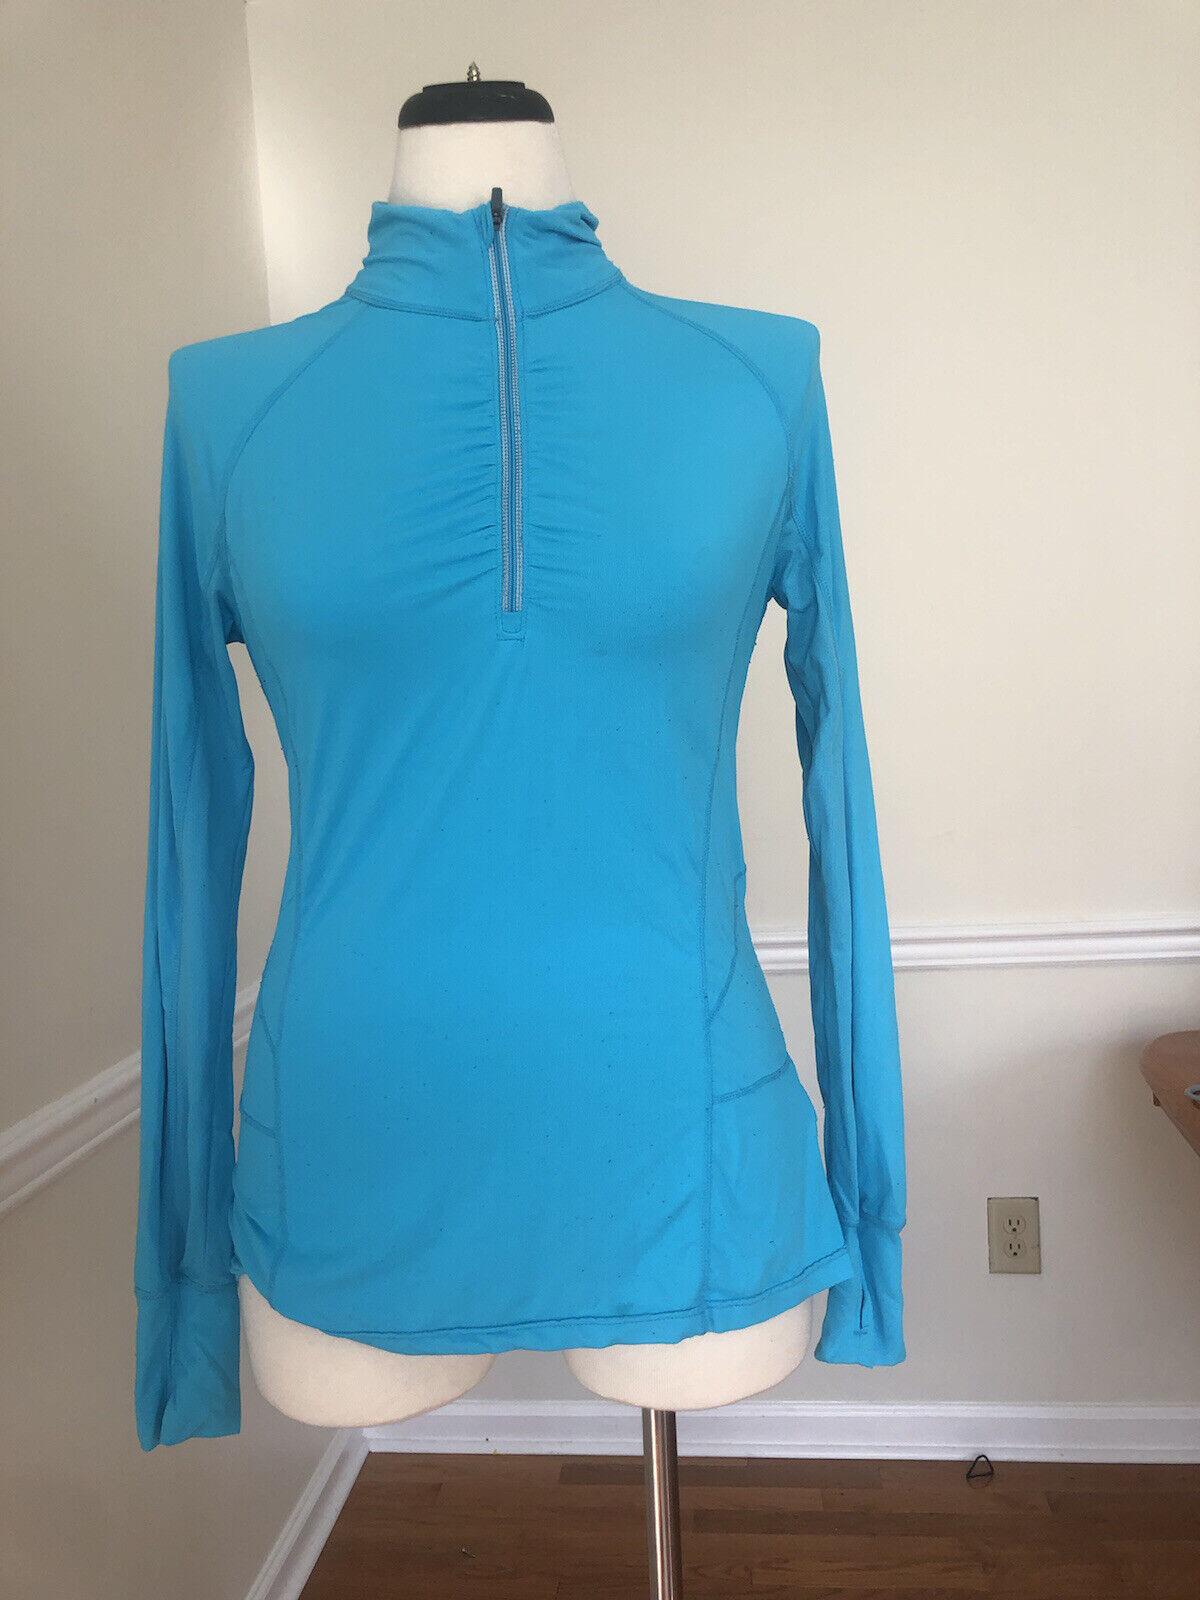 active top, long sleeves, nylon blend blue emerald SZ M